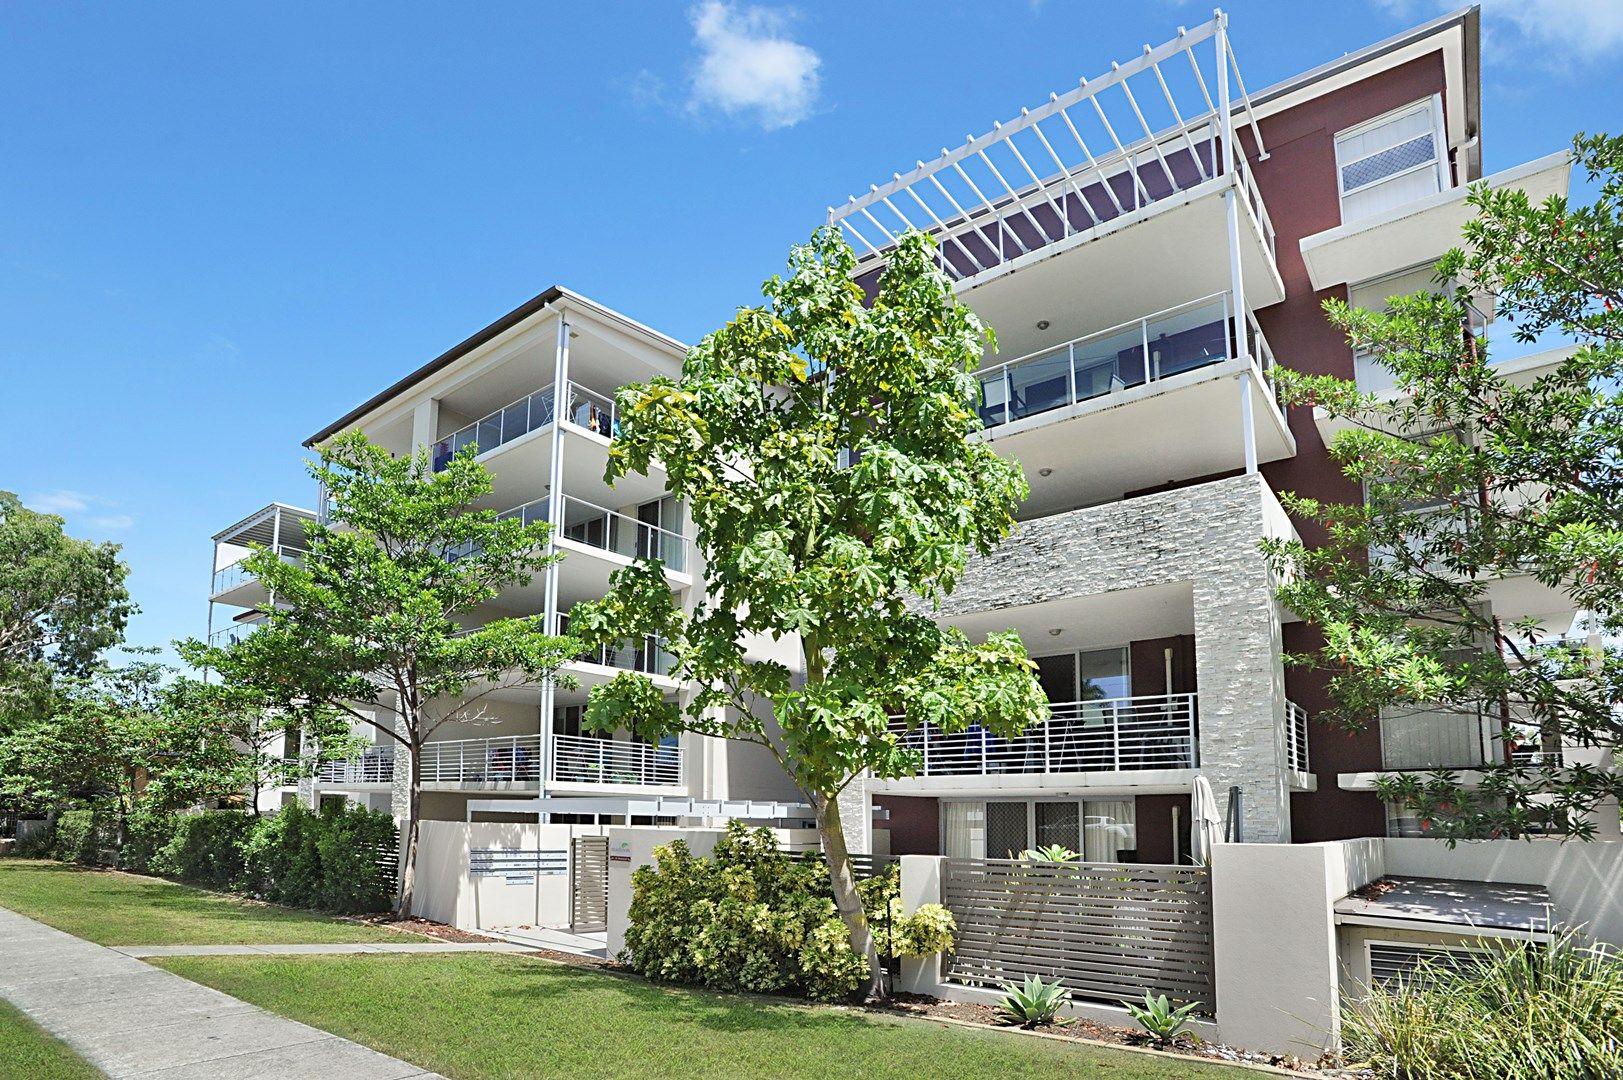 42/24 Westacott Street, Nundah QLD 4012, Image 0